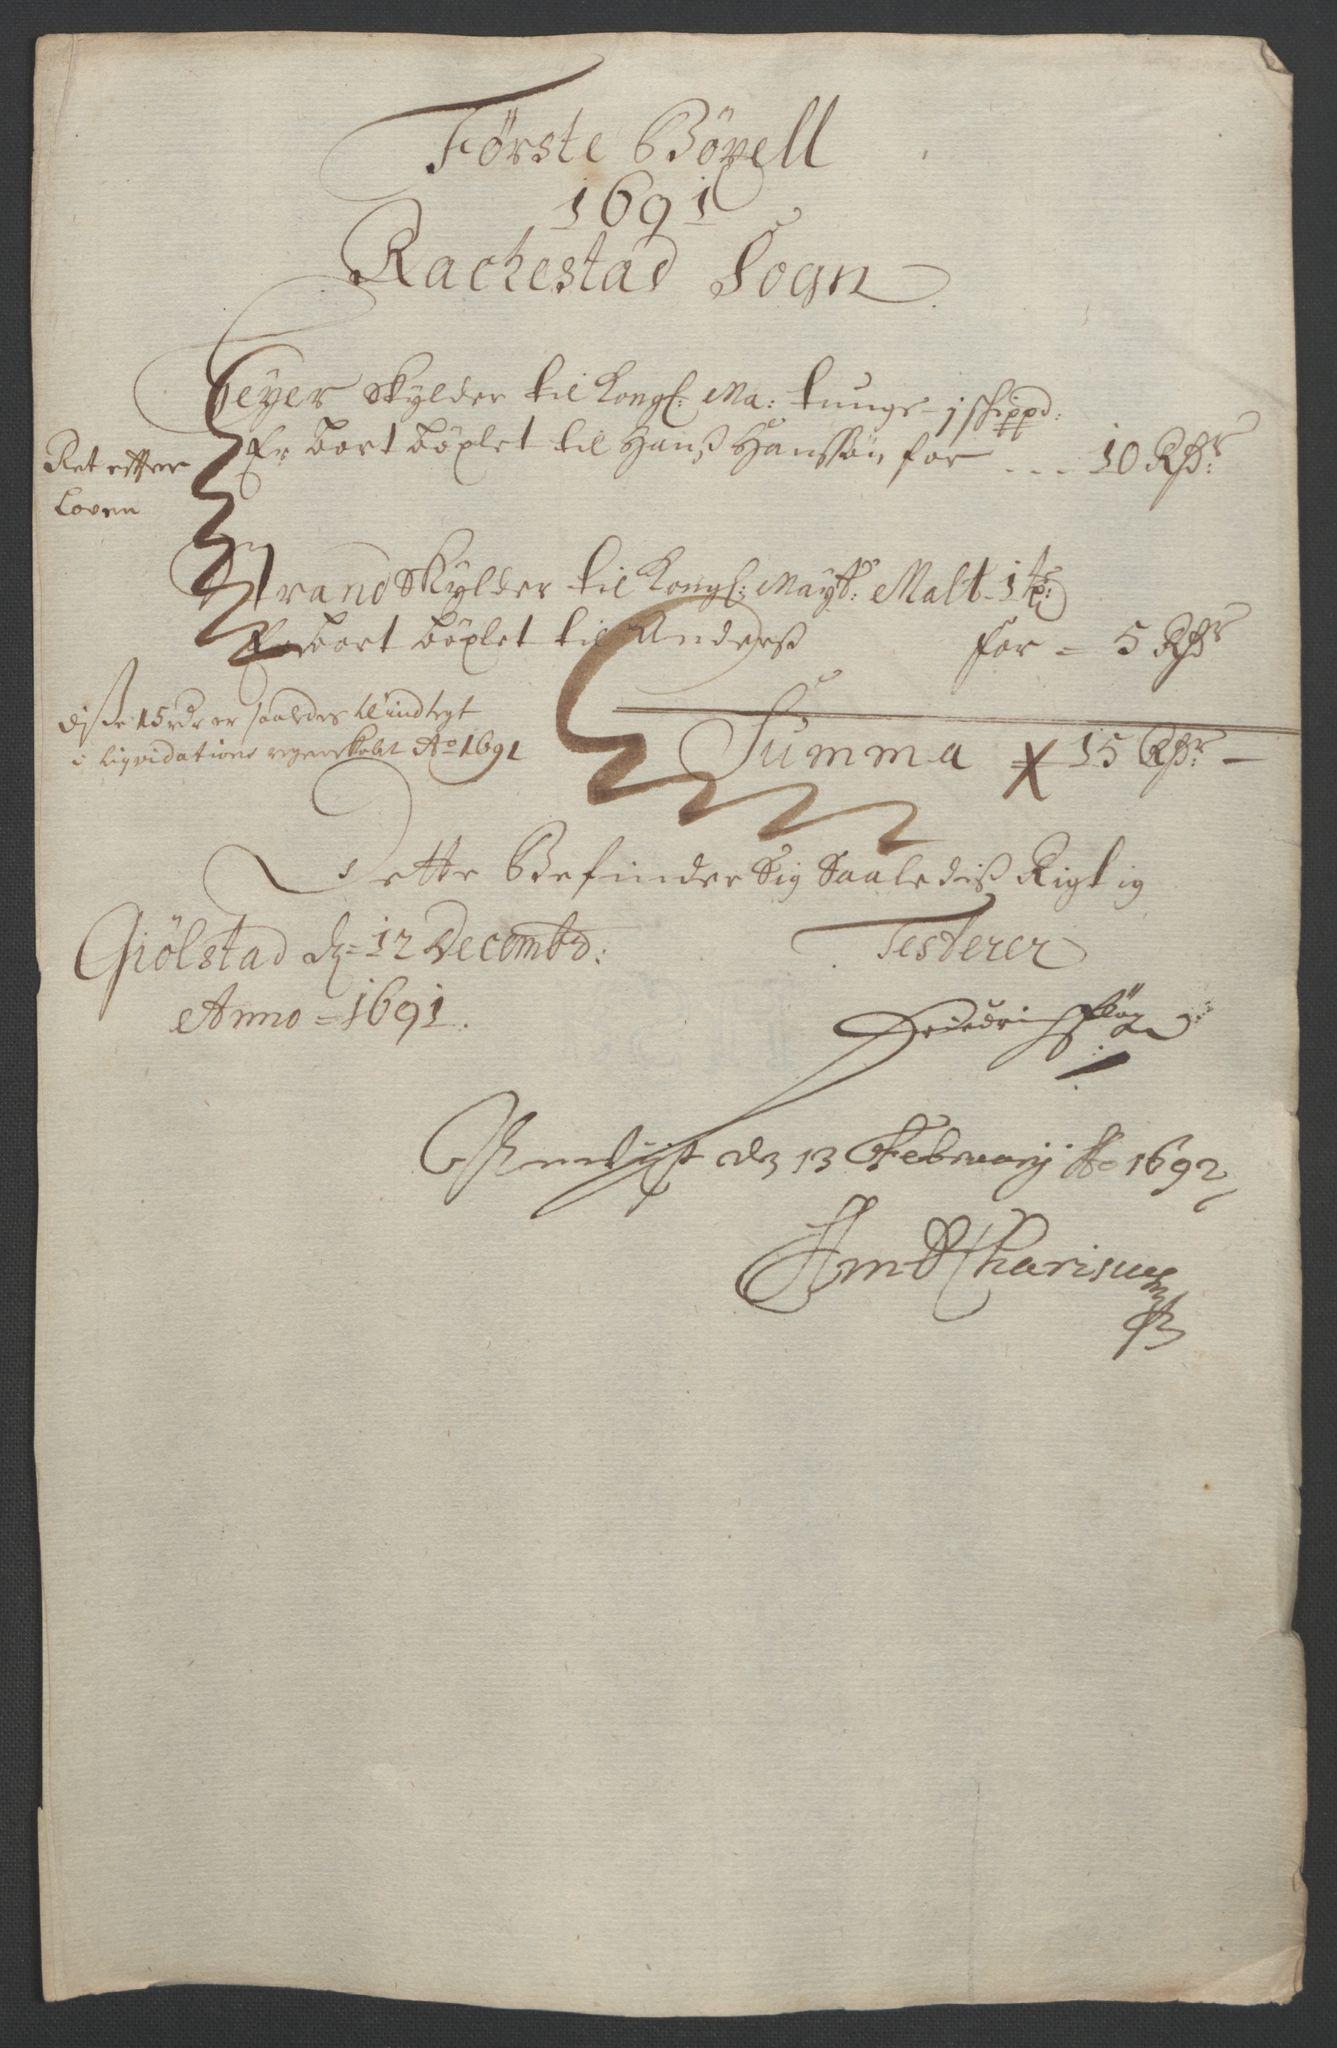 RA, Rentekammeret inntil 1814, Reviderte regnskaper, Fogderegnskap, R05/L0278: Fogderegnskap Rakkestad, 1691-1693, s. 16